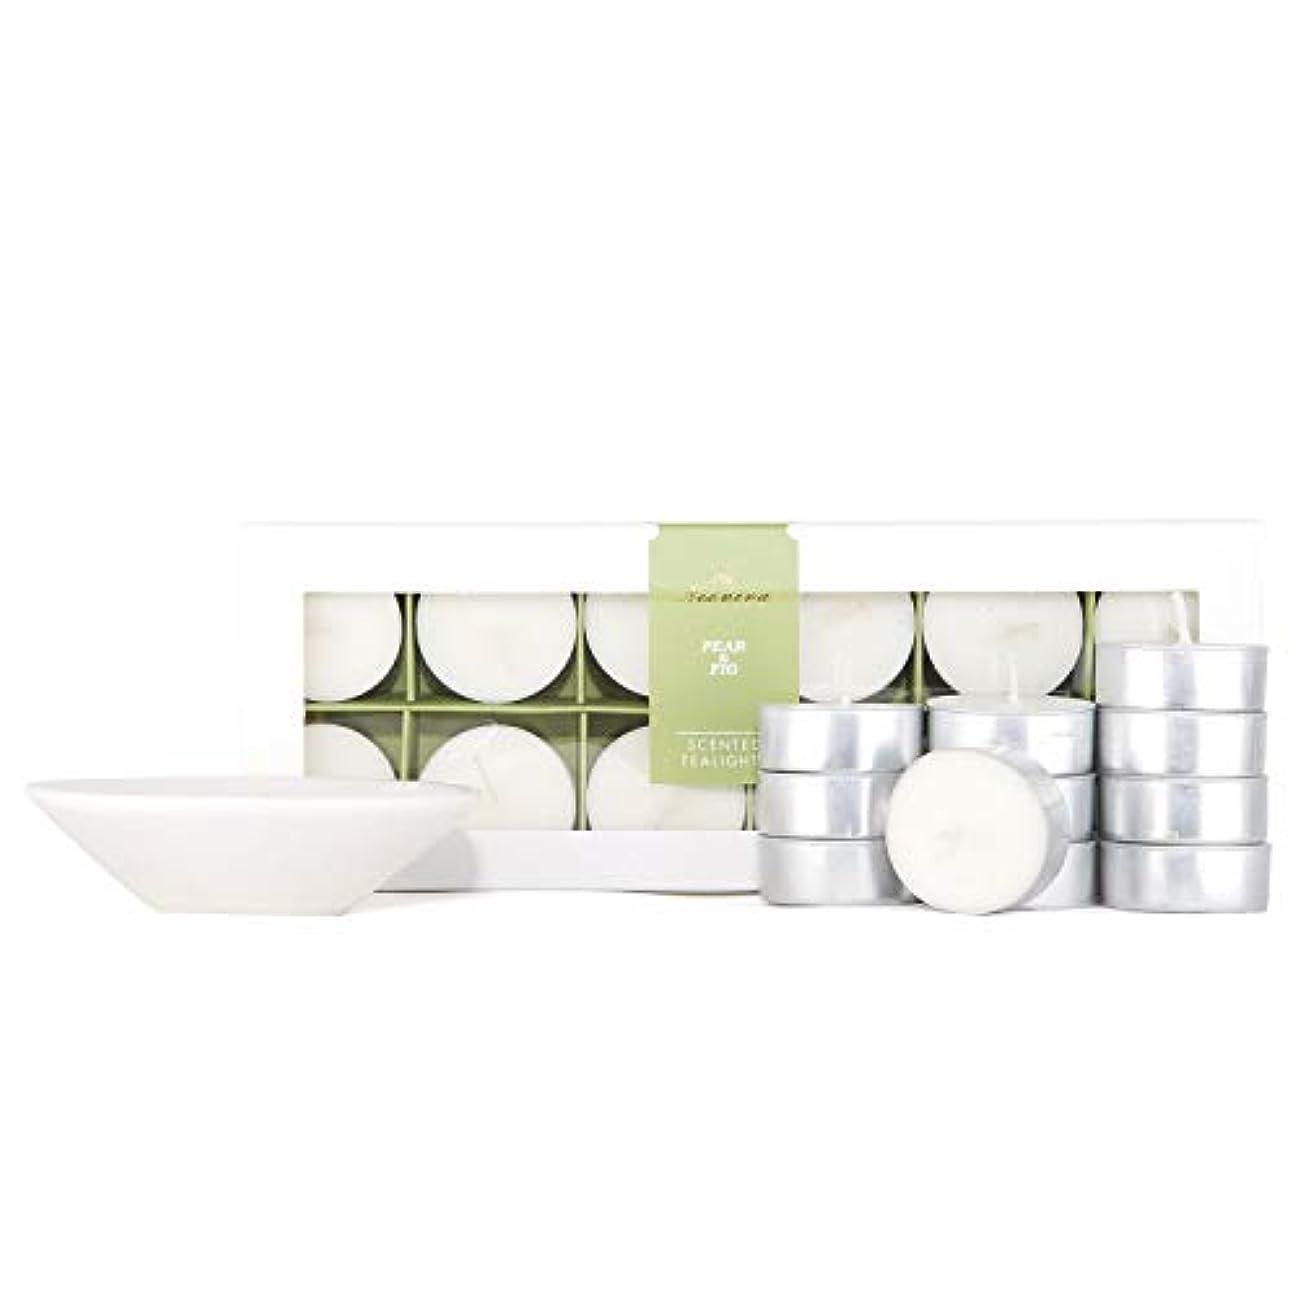 NEOVIVA HOME アロマテラピーキャンドル 100%天然エッセンシャルオイル 香り付きキャンドル 大豆ワックス ストレス解消 アロマセラピー用 ギフトセット 12パック Pear&Fig